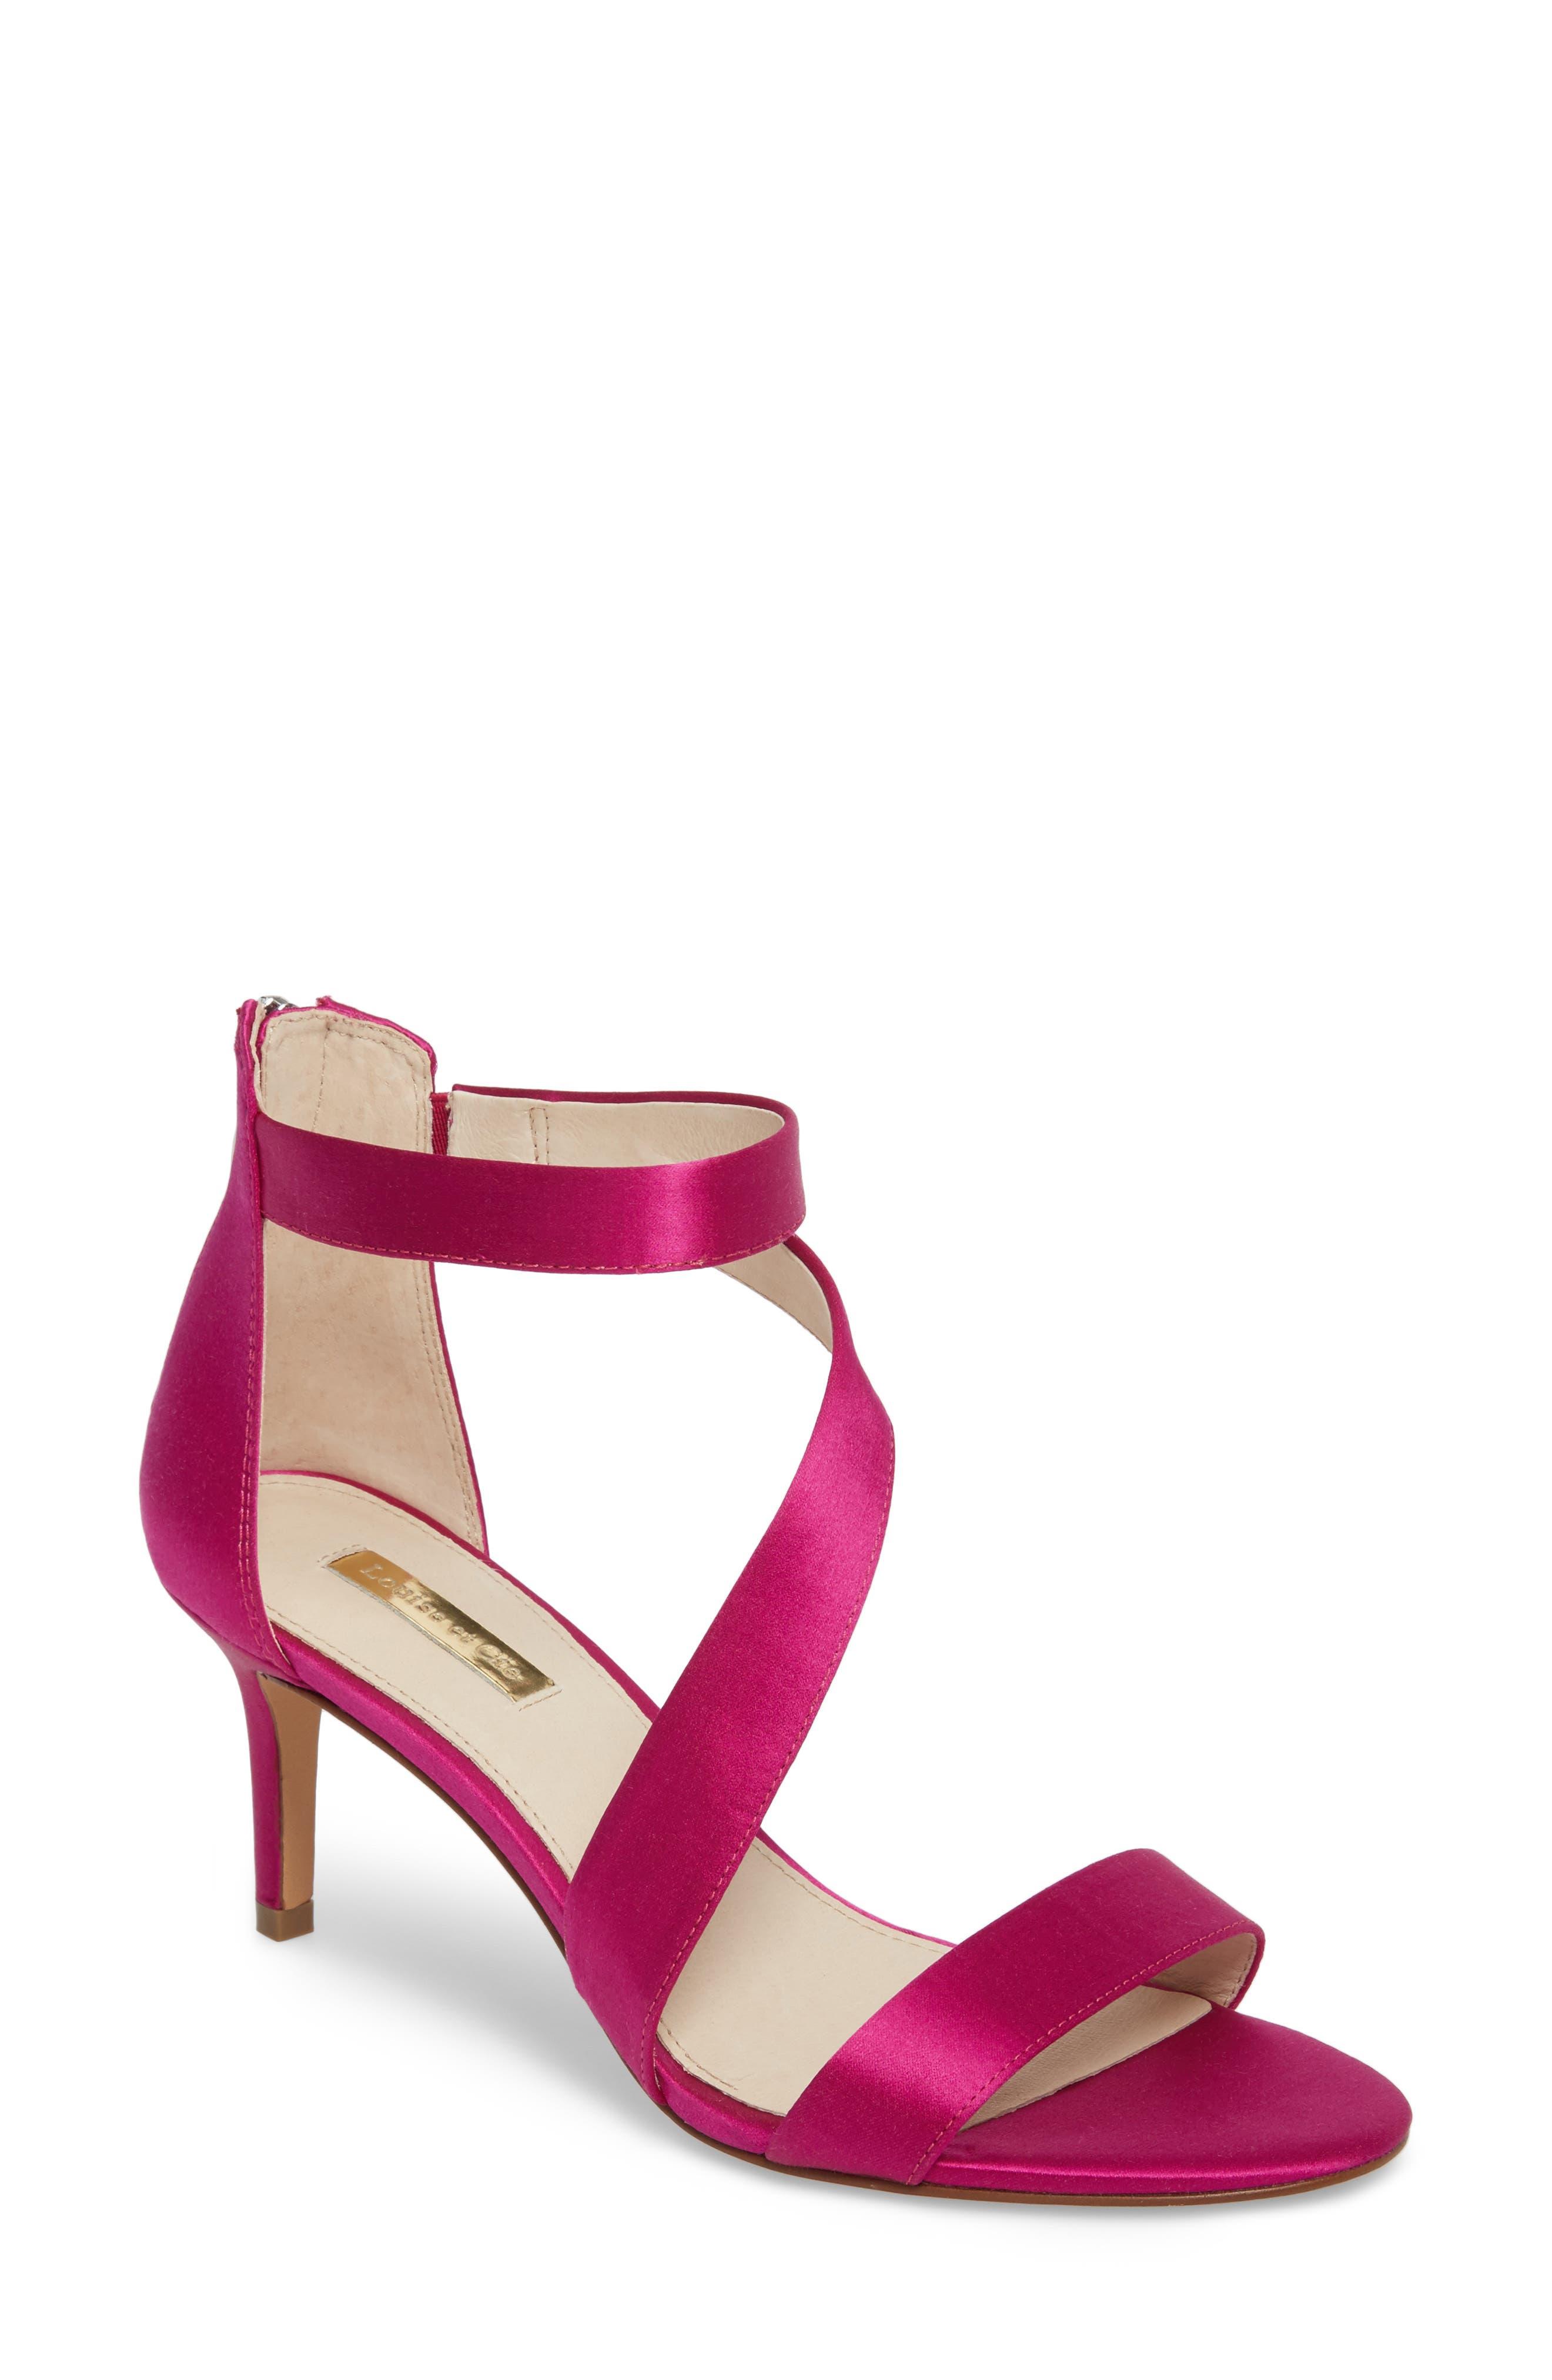 Hilio Sandal,                             Main thumbnail 1, color,                             Electric Pink Satin